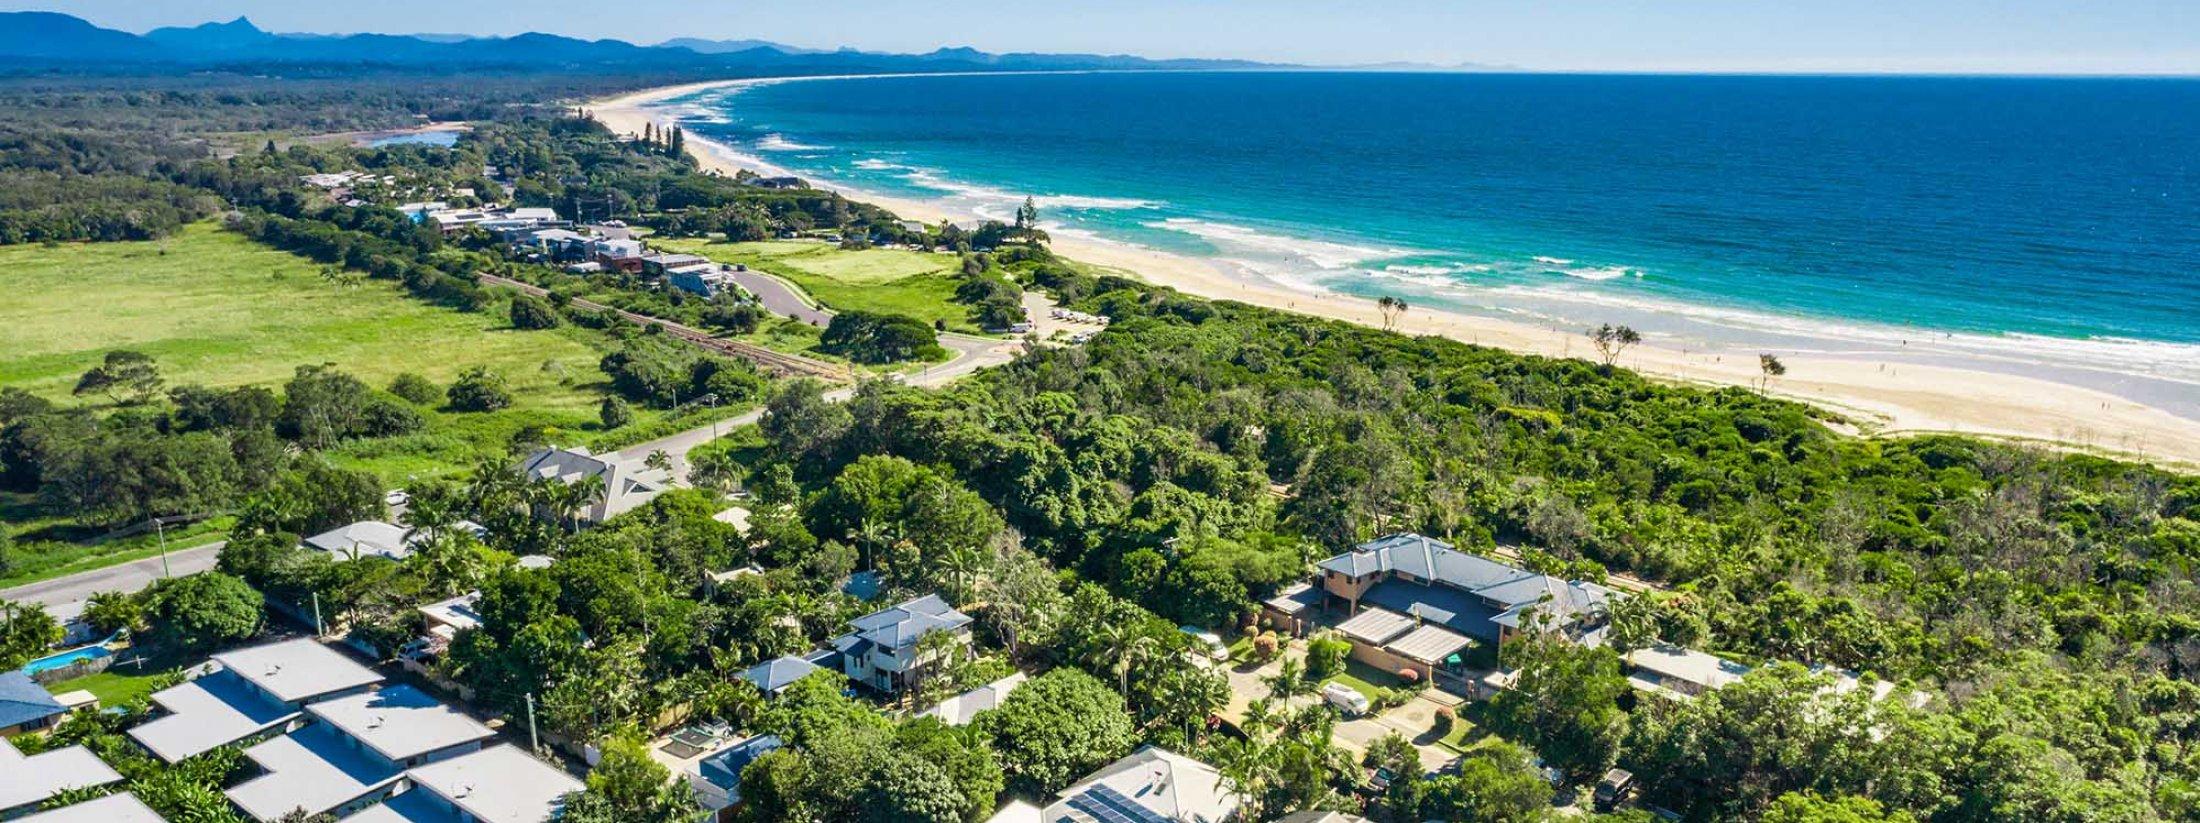 Cavvanbah Seaside Cottage - Byron Bay - Aerial towards North